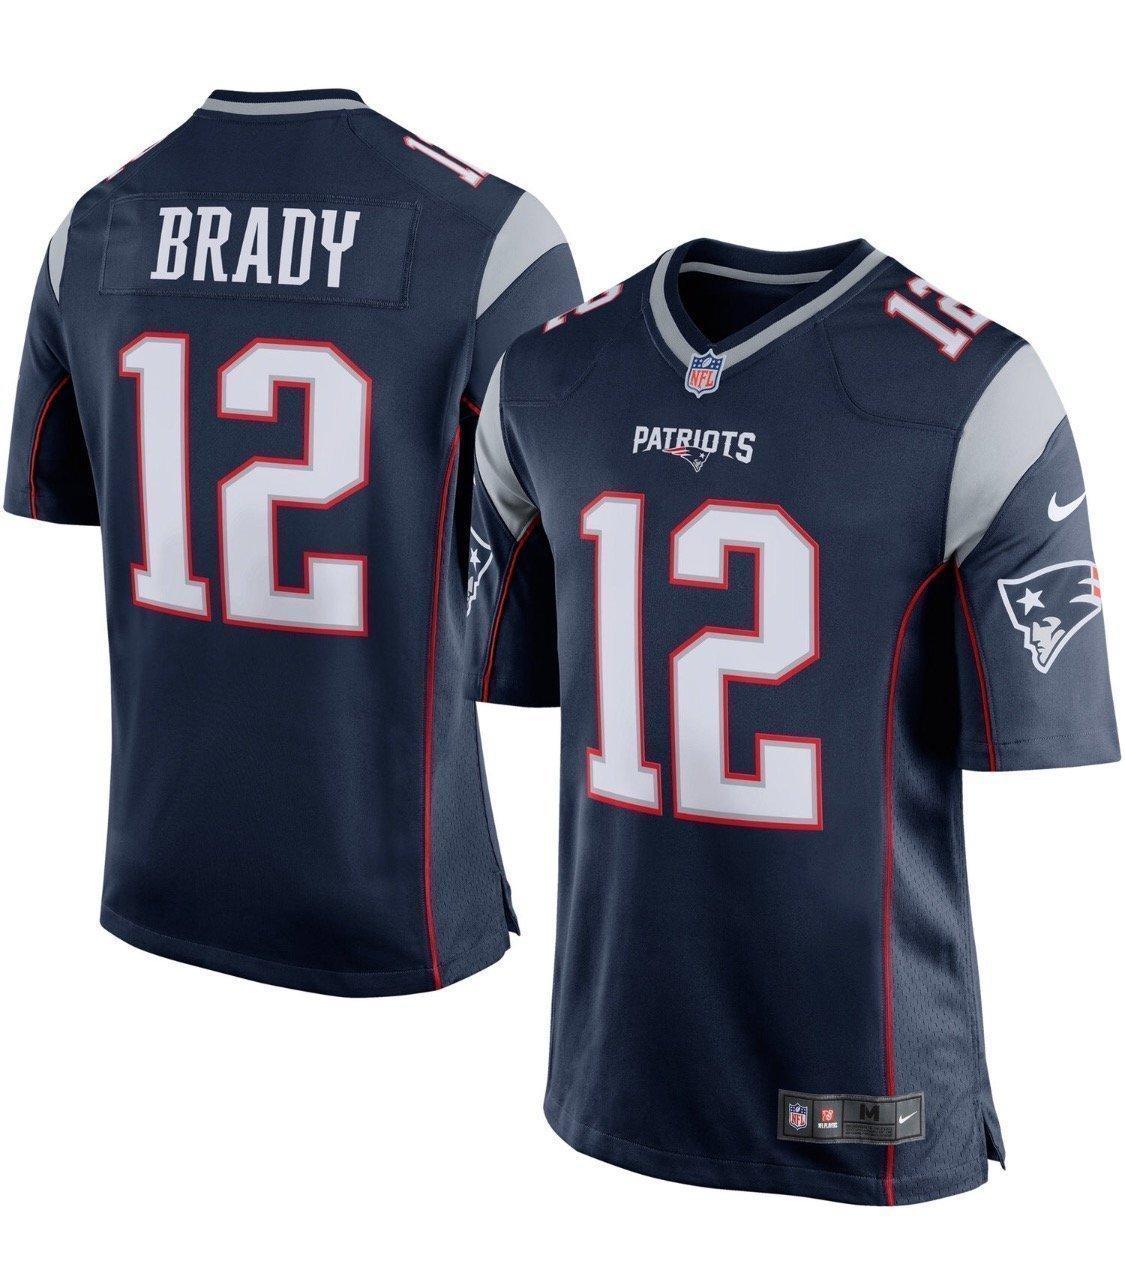 0707247b4 Men s New England Patriots Tom Brady  12 Navy Blue Silver Game Jersey(size  large)  Amazon.co.uk  Sports   Outdoors